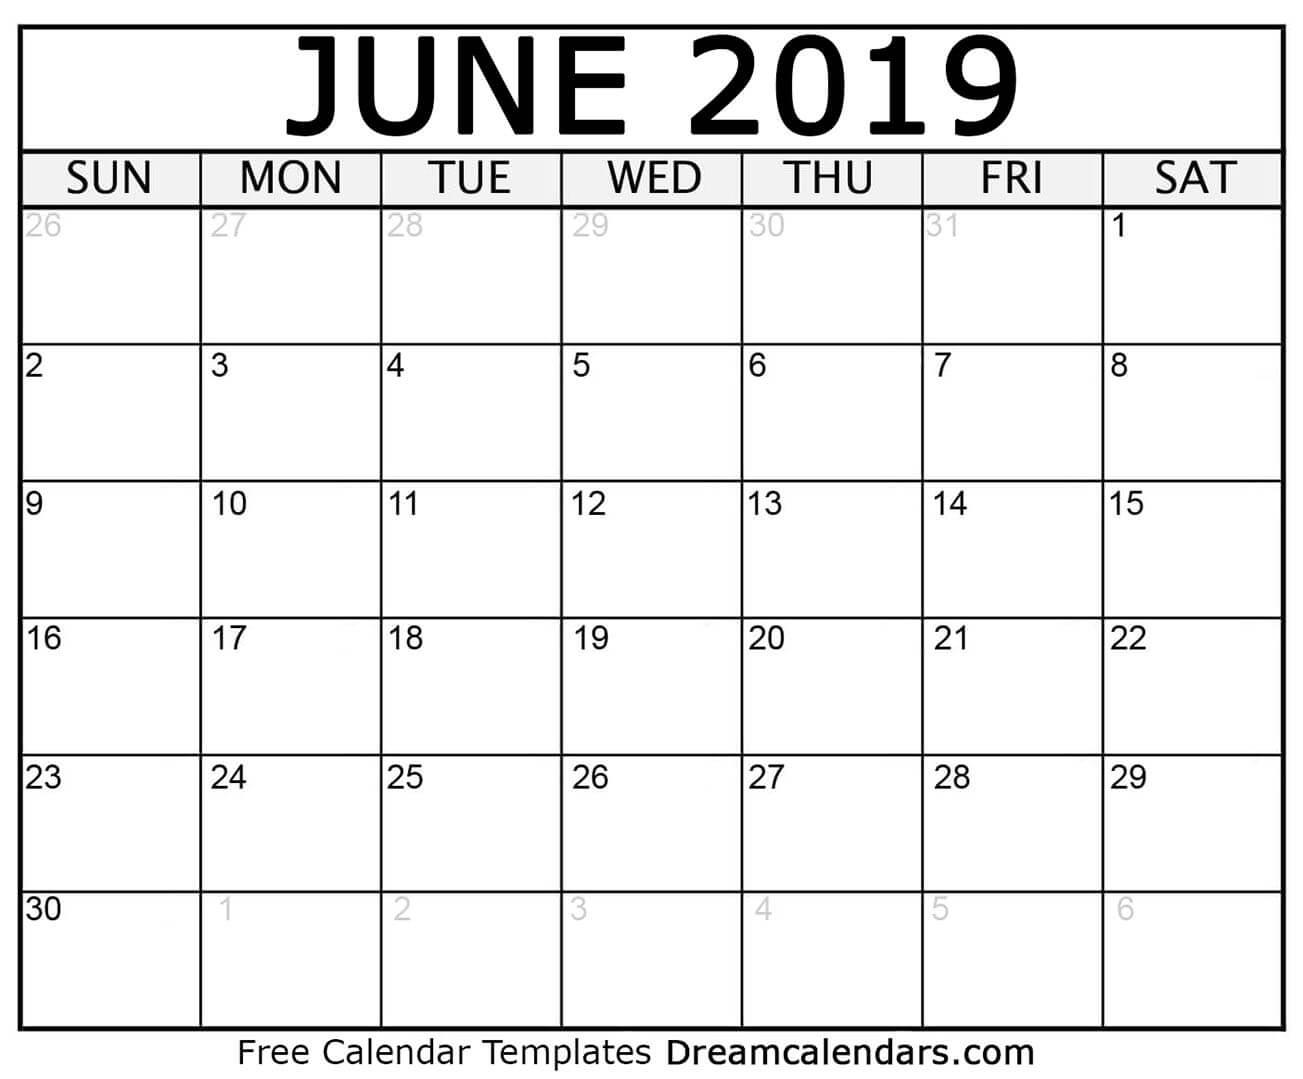 Free Blank June 2019 Printable Calendar